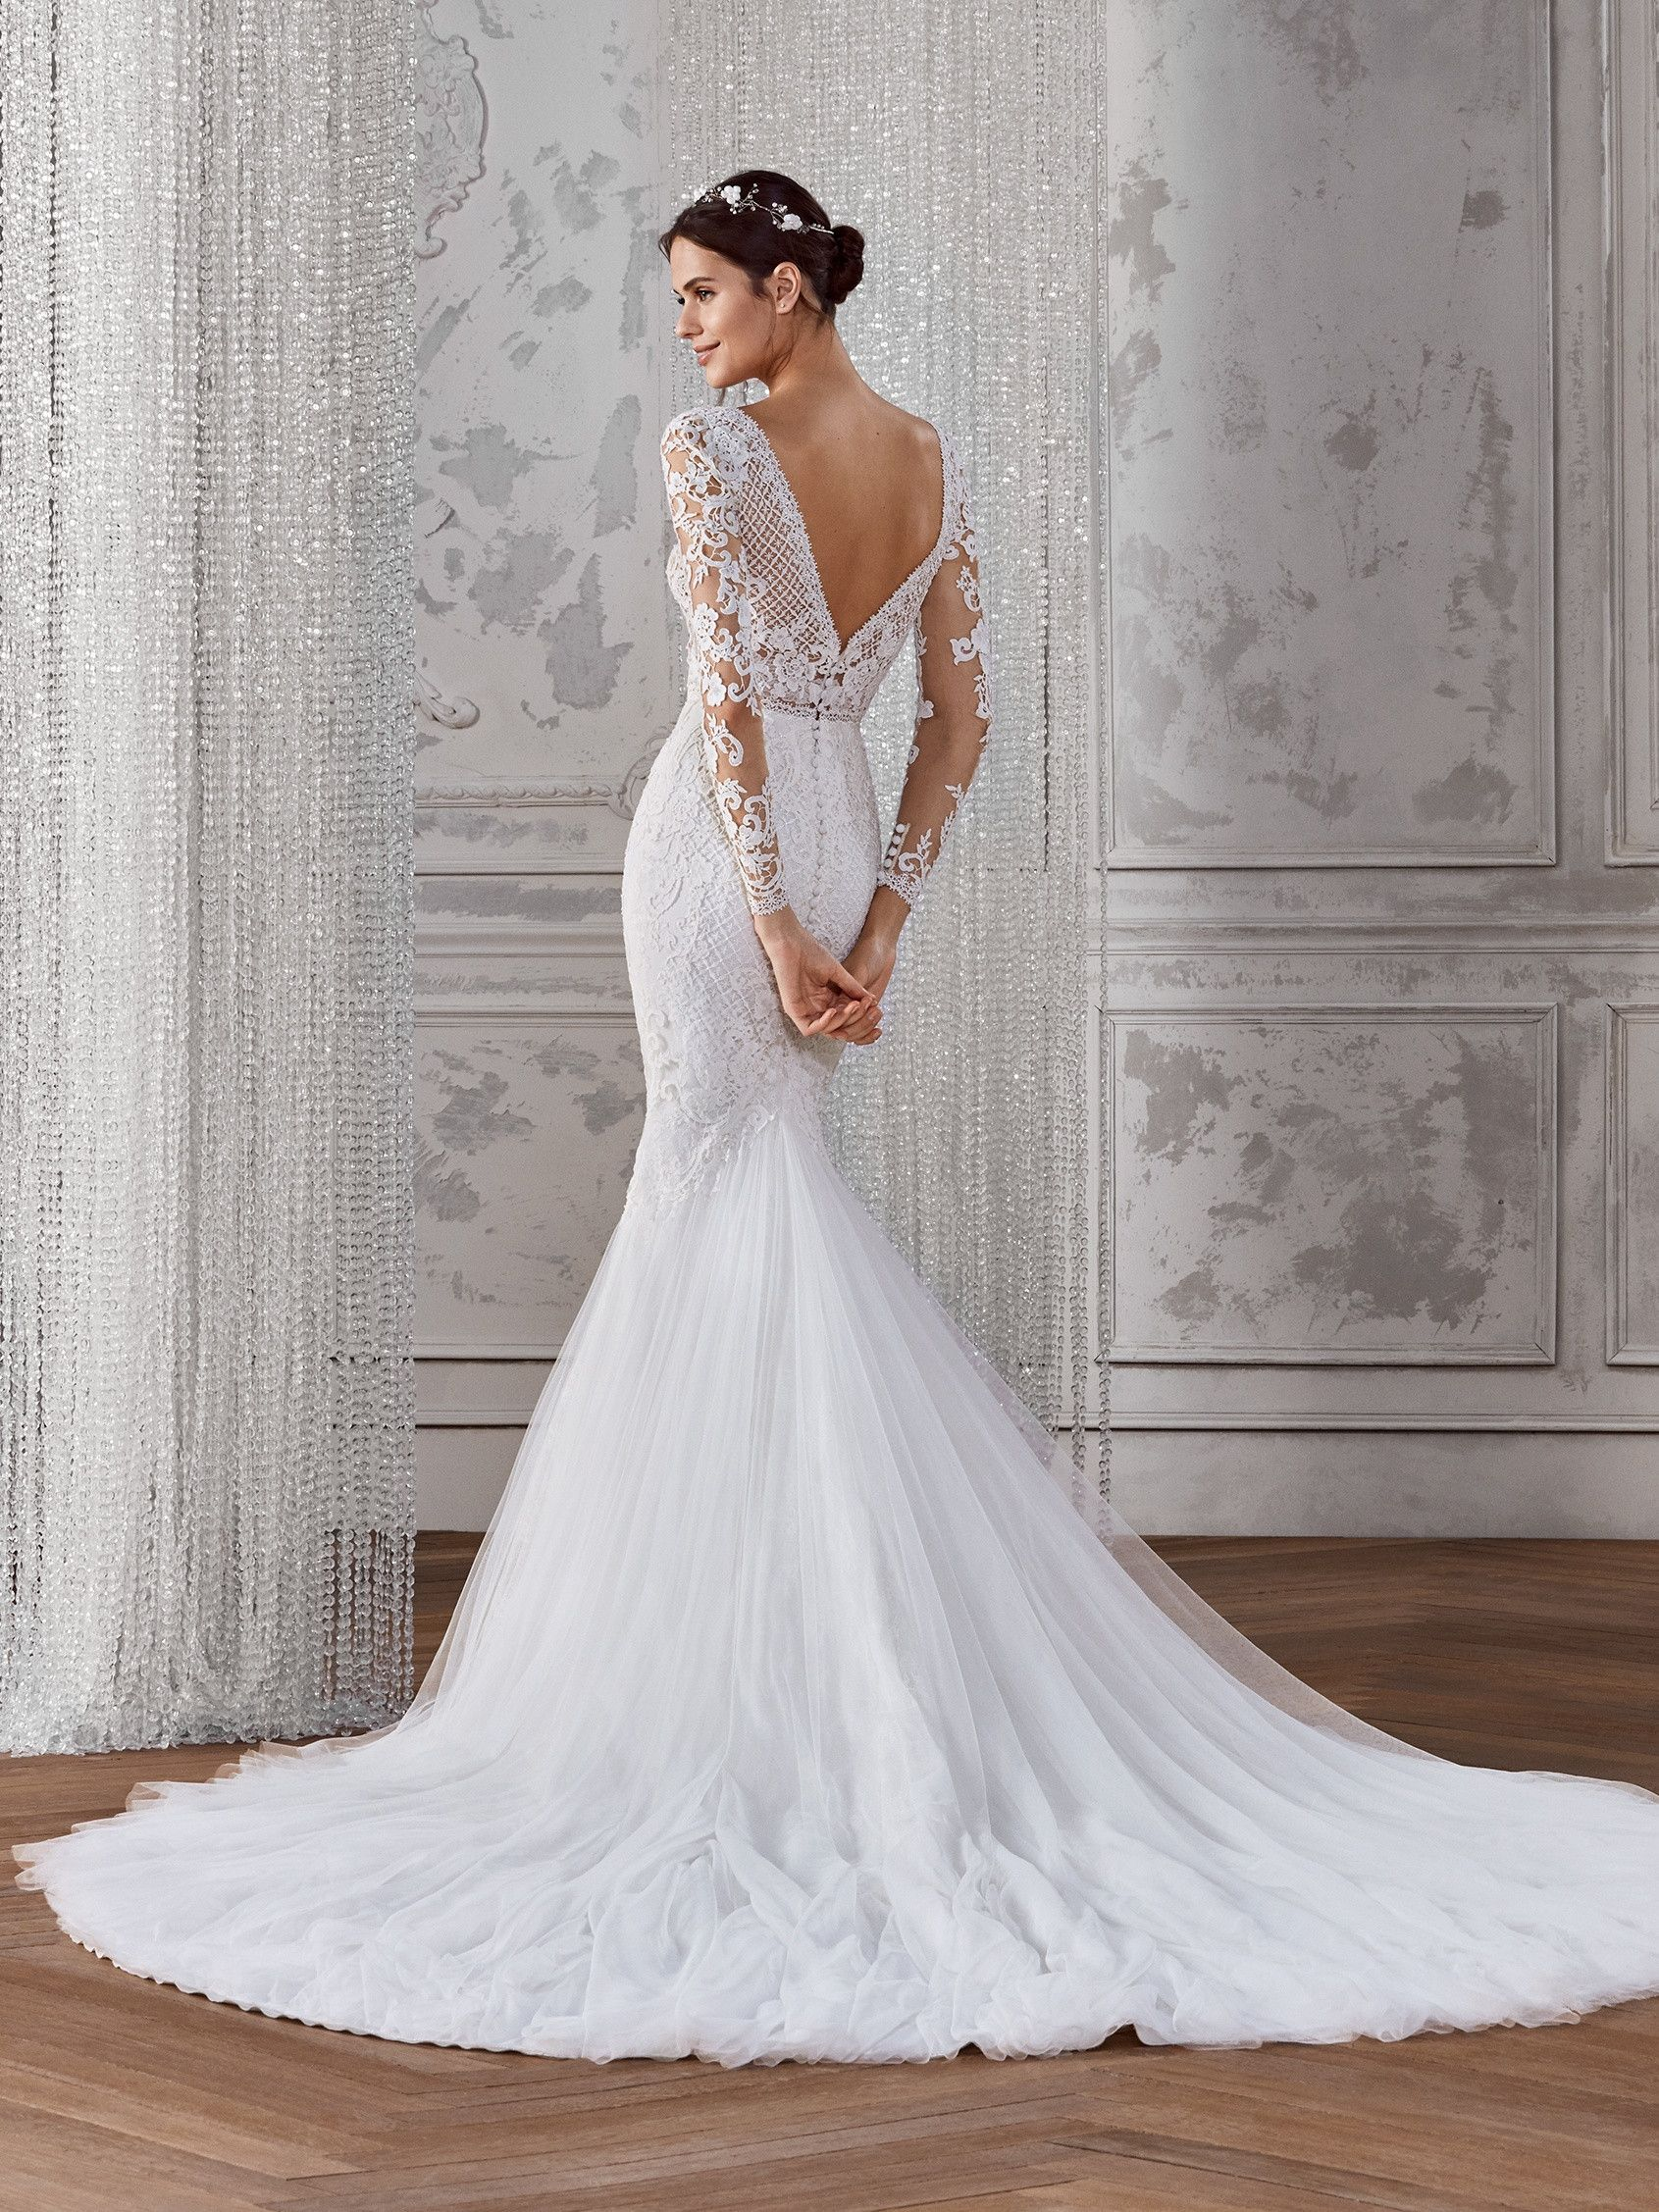 Kadie Long Sleeve Mermaid Wedding Dress With V Neck In 2020 Slim Fit Wedding Dresses Long Sleeve Mermaid Wedding Dress Fitted Lace Wedding Dress [ 2255 x 1691 Pixel ]